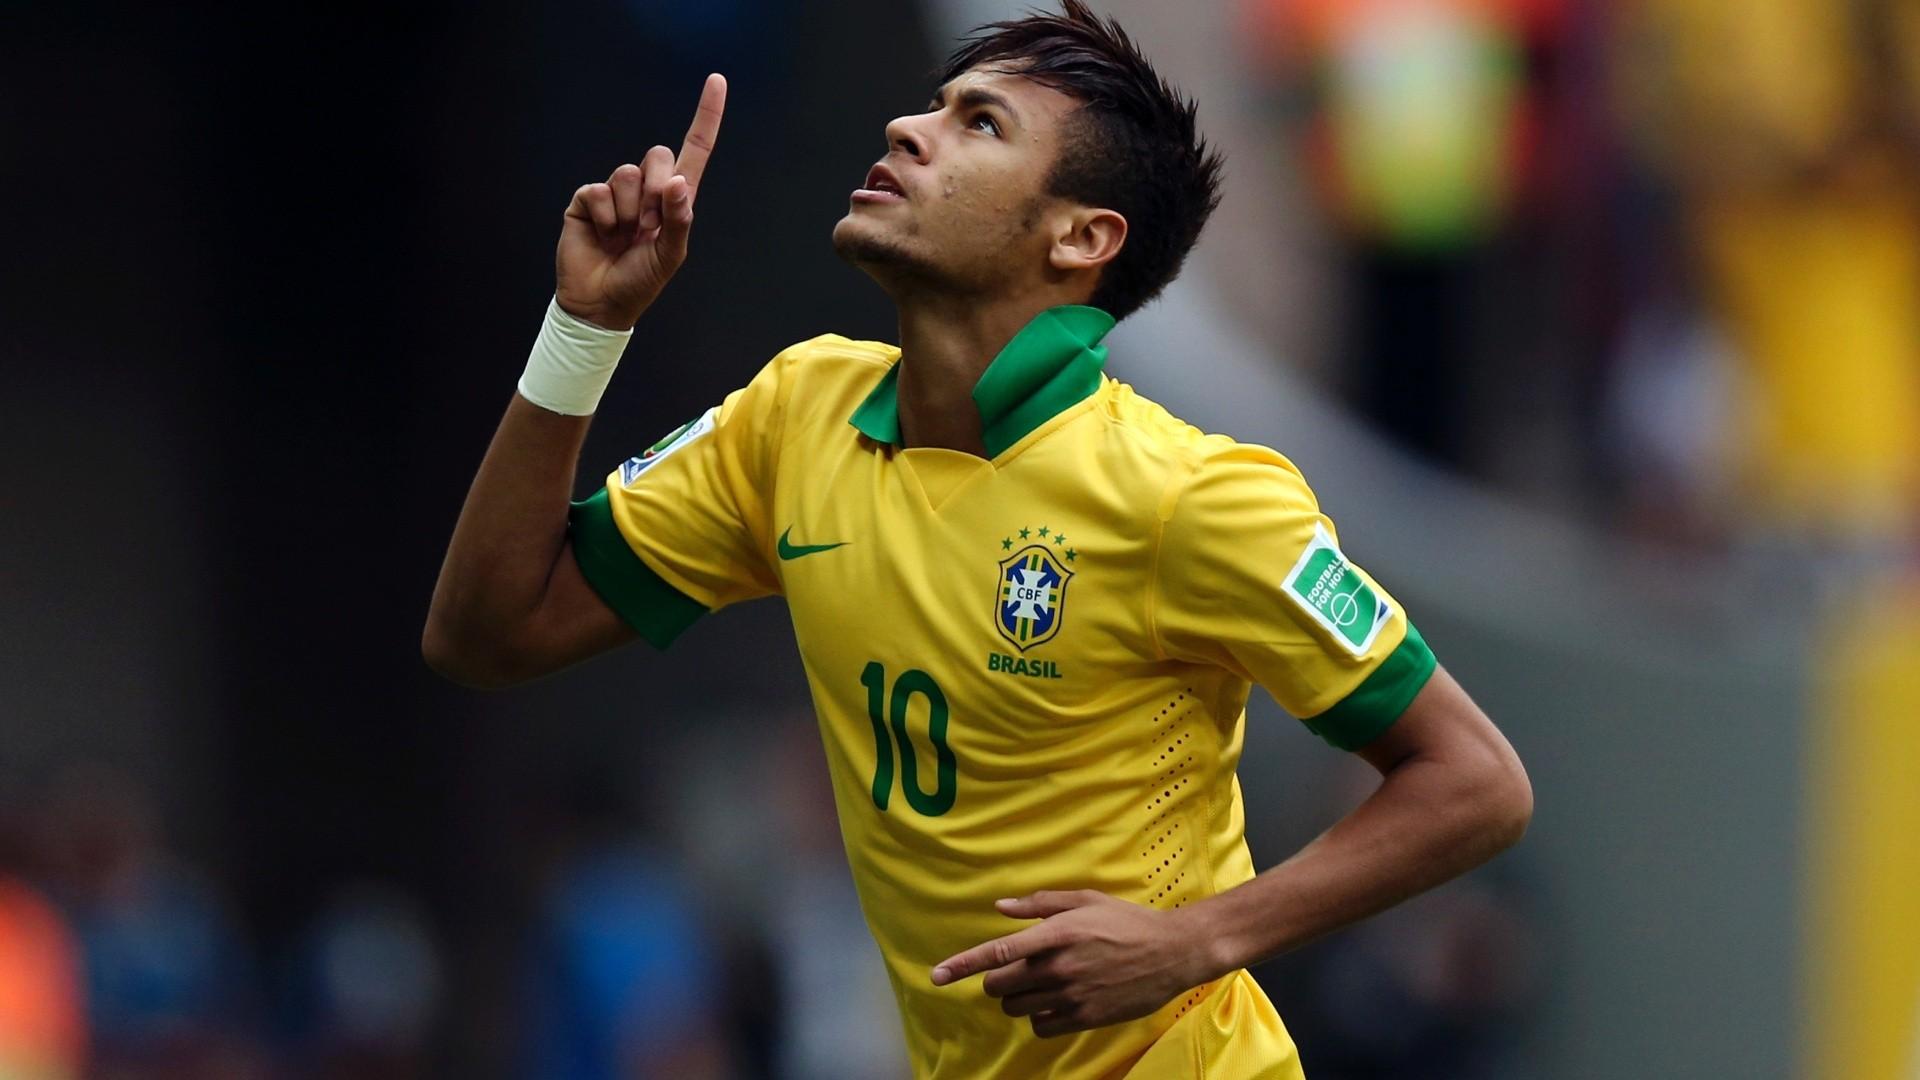 Neymar Wallpapers Celebrate Brazils Bright Soccer Future 1920x1080